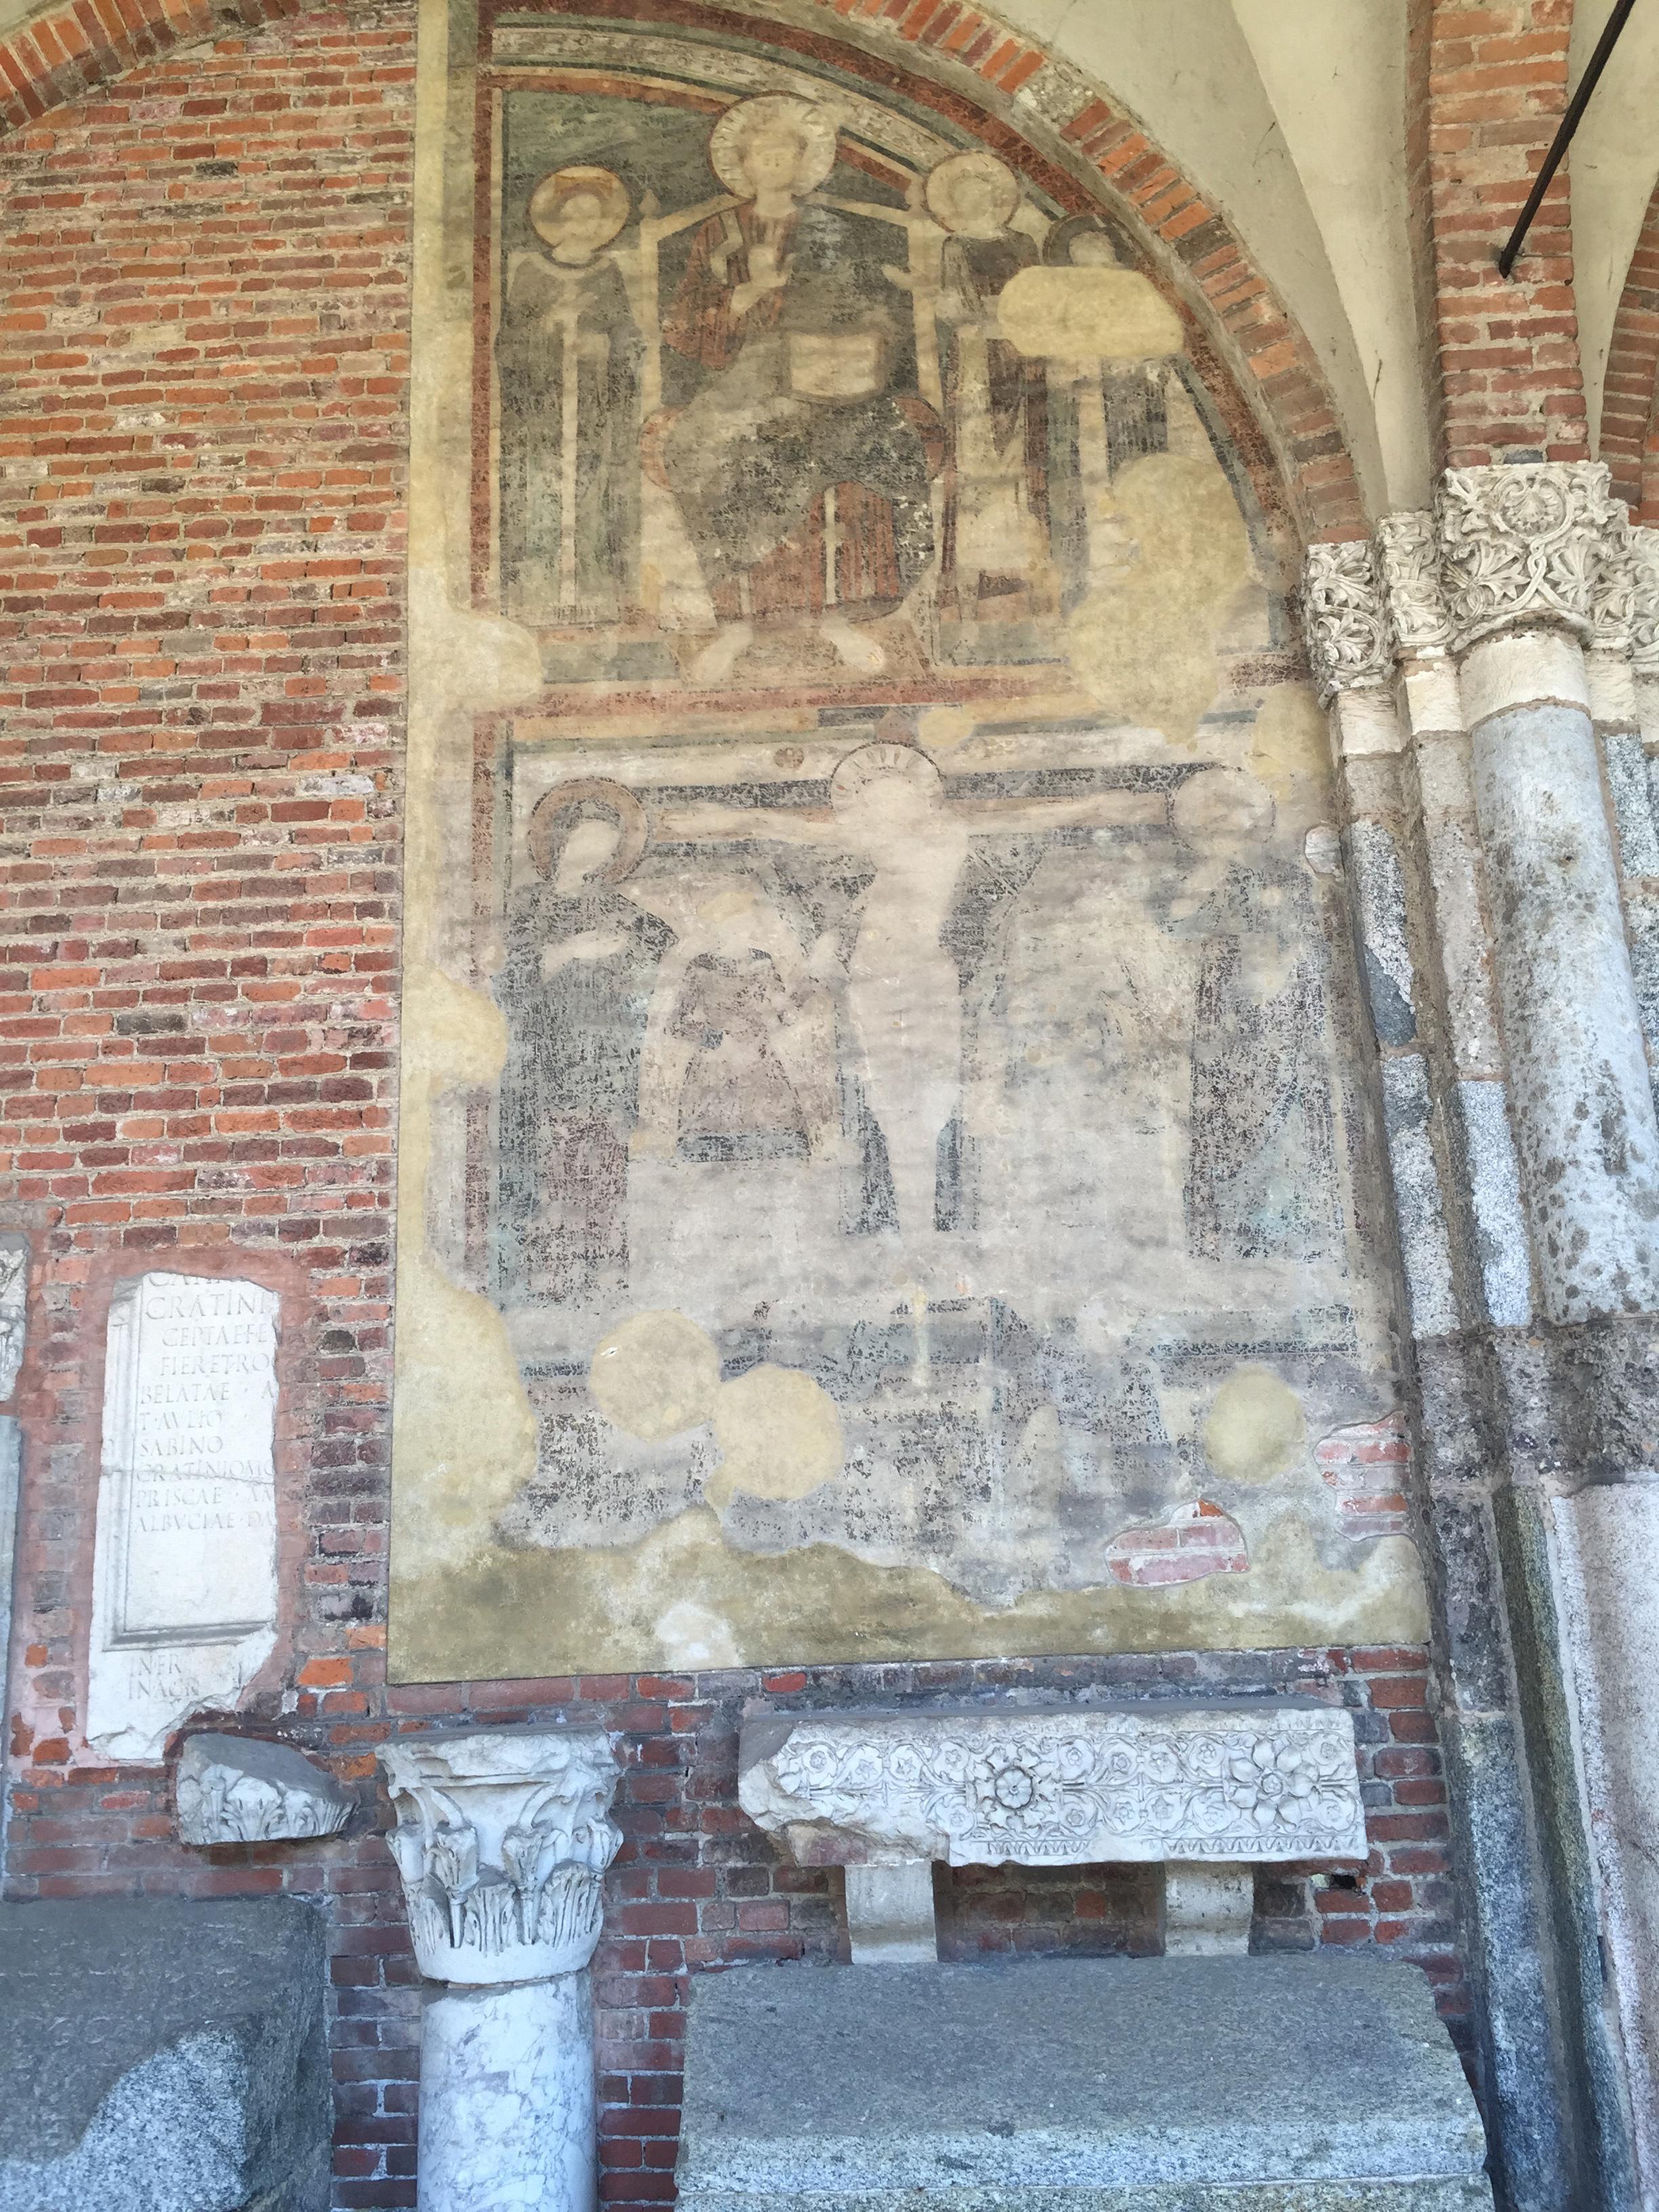 S. Ambrogio fresco n fragments